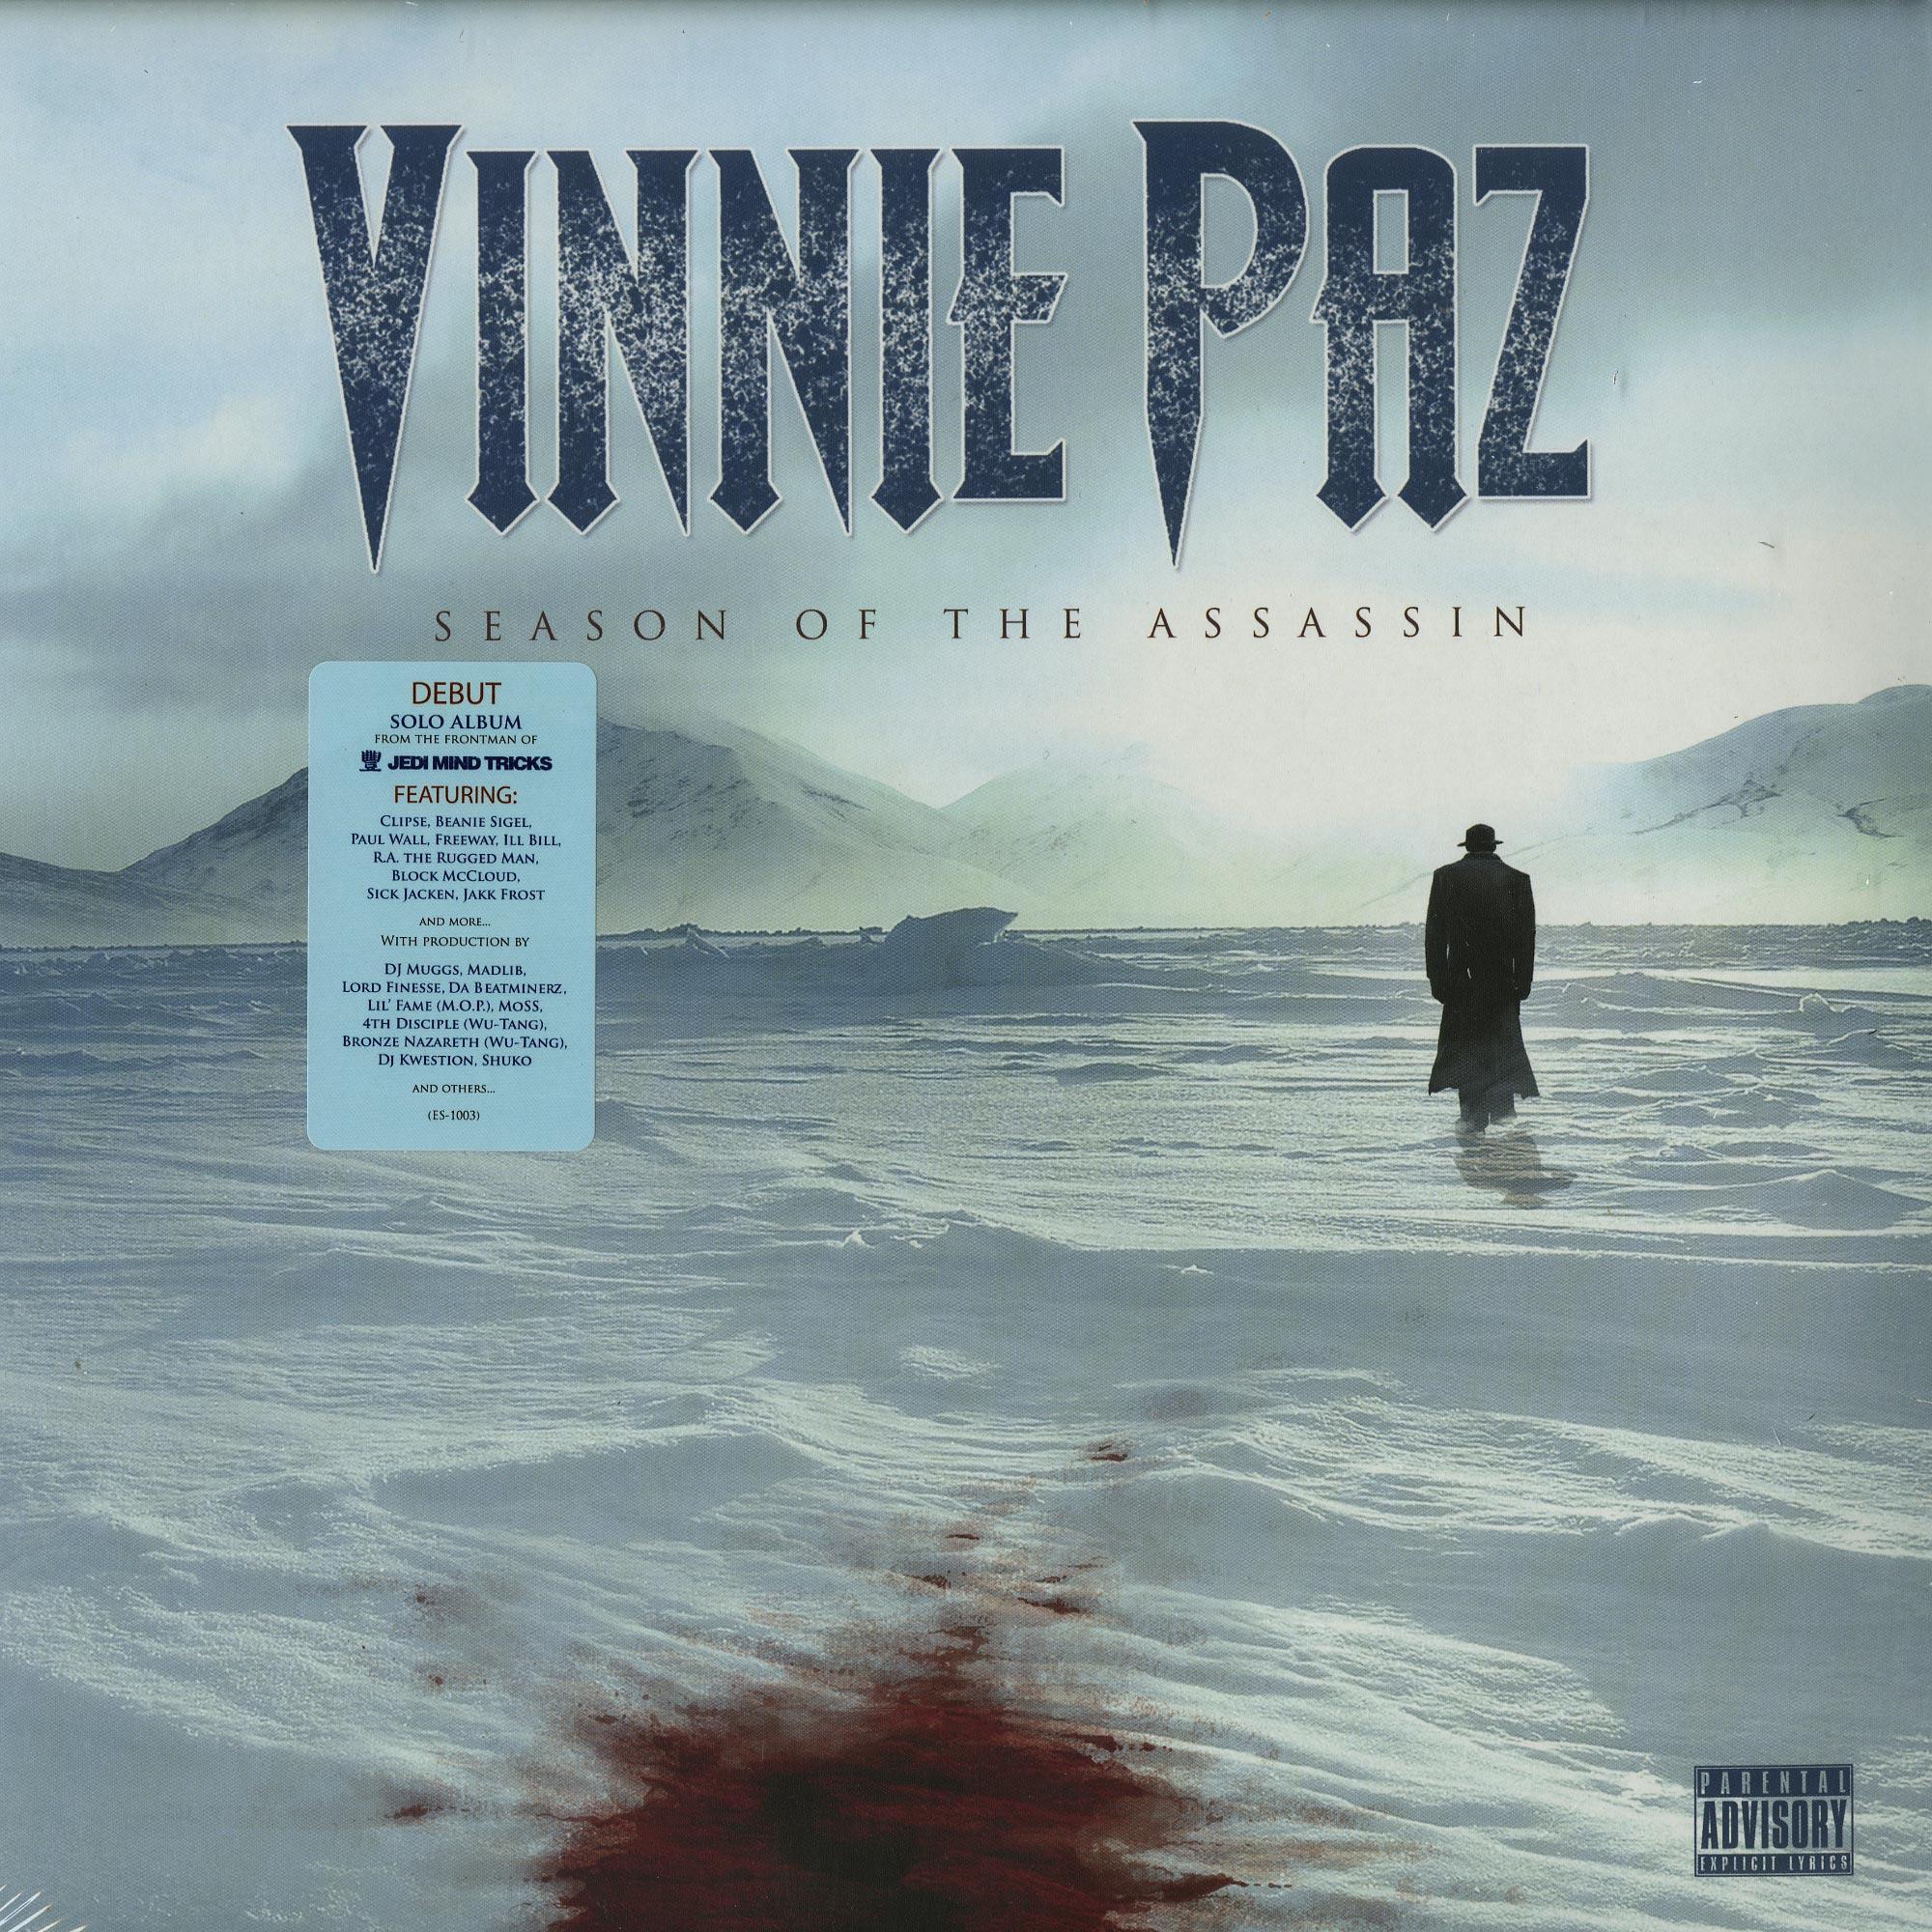 Vinnie Paz - SEASON OF THE ASSASSIN